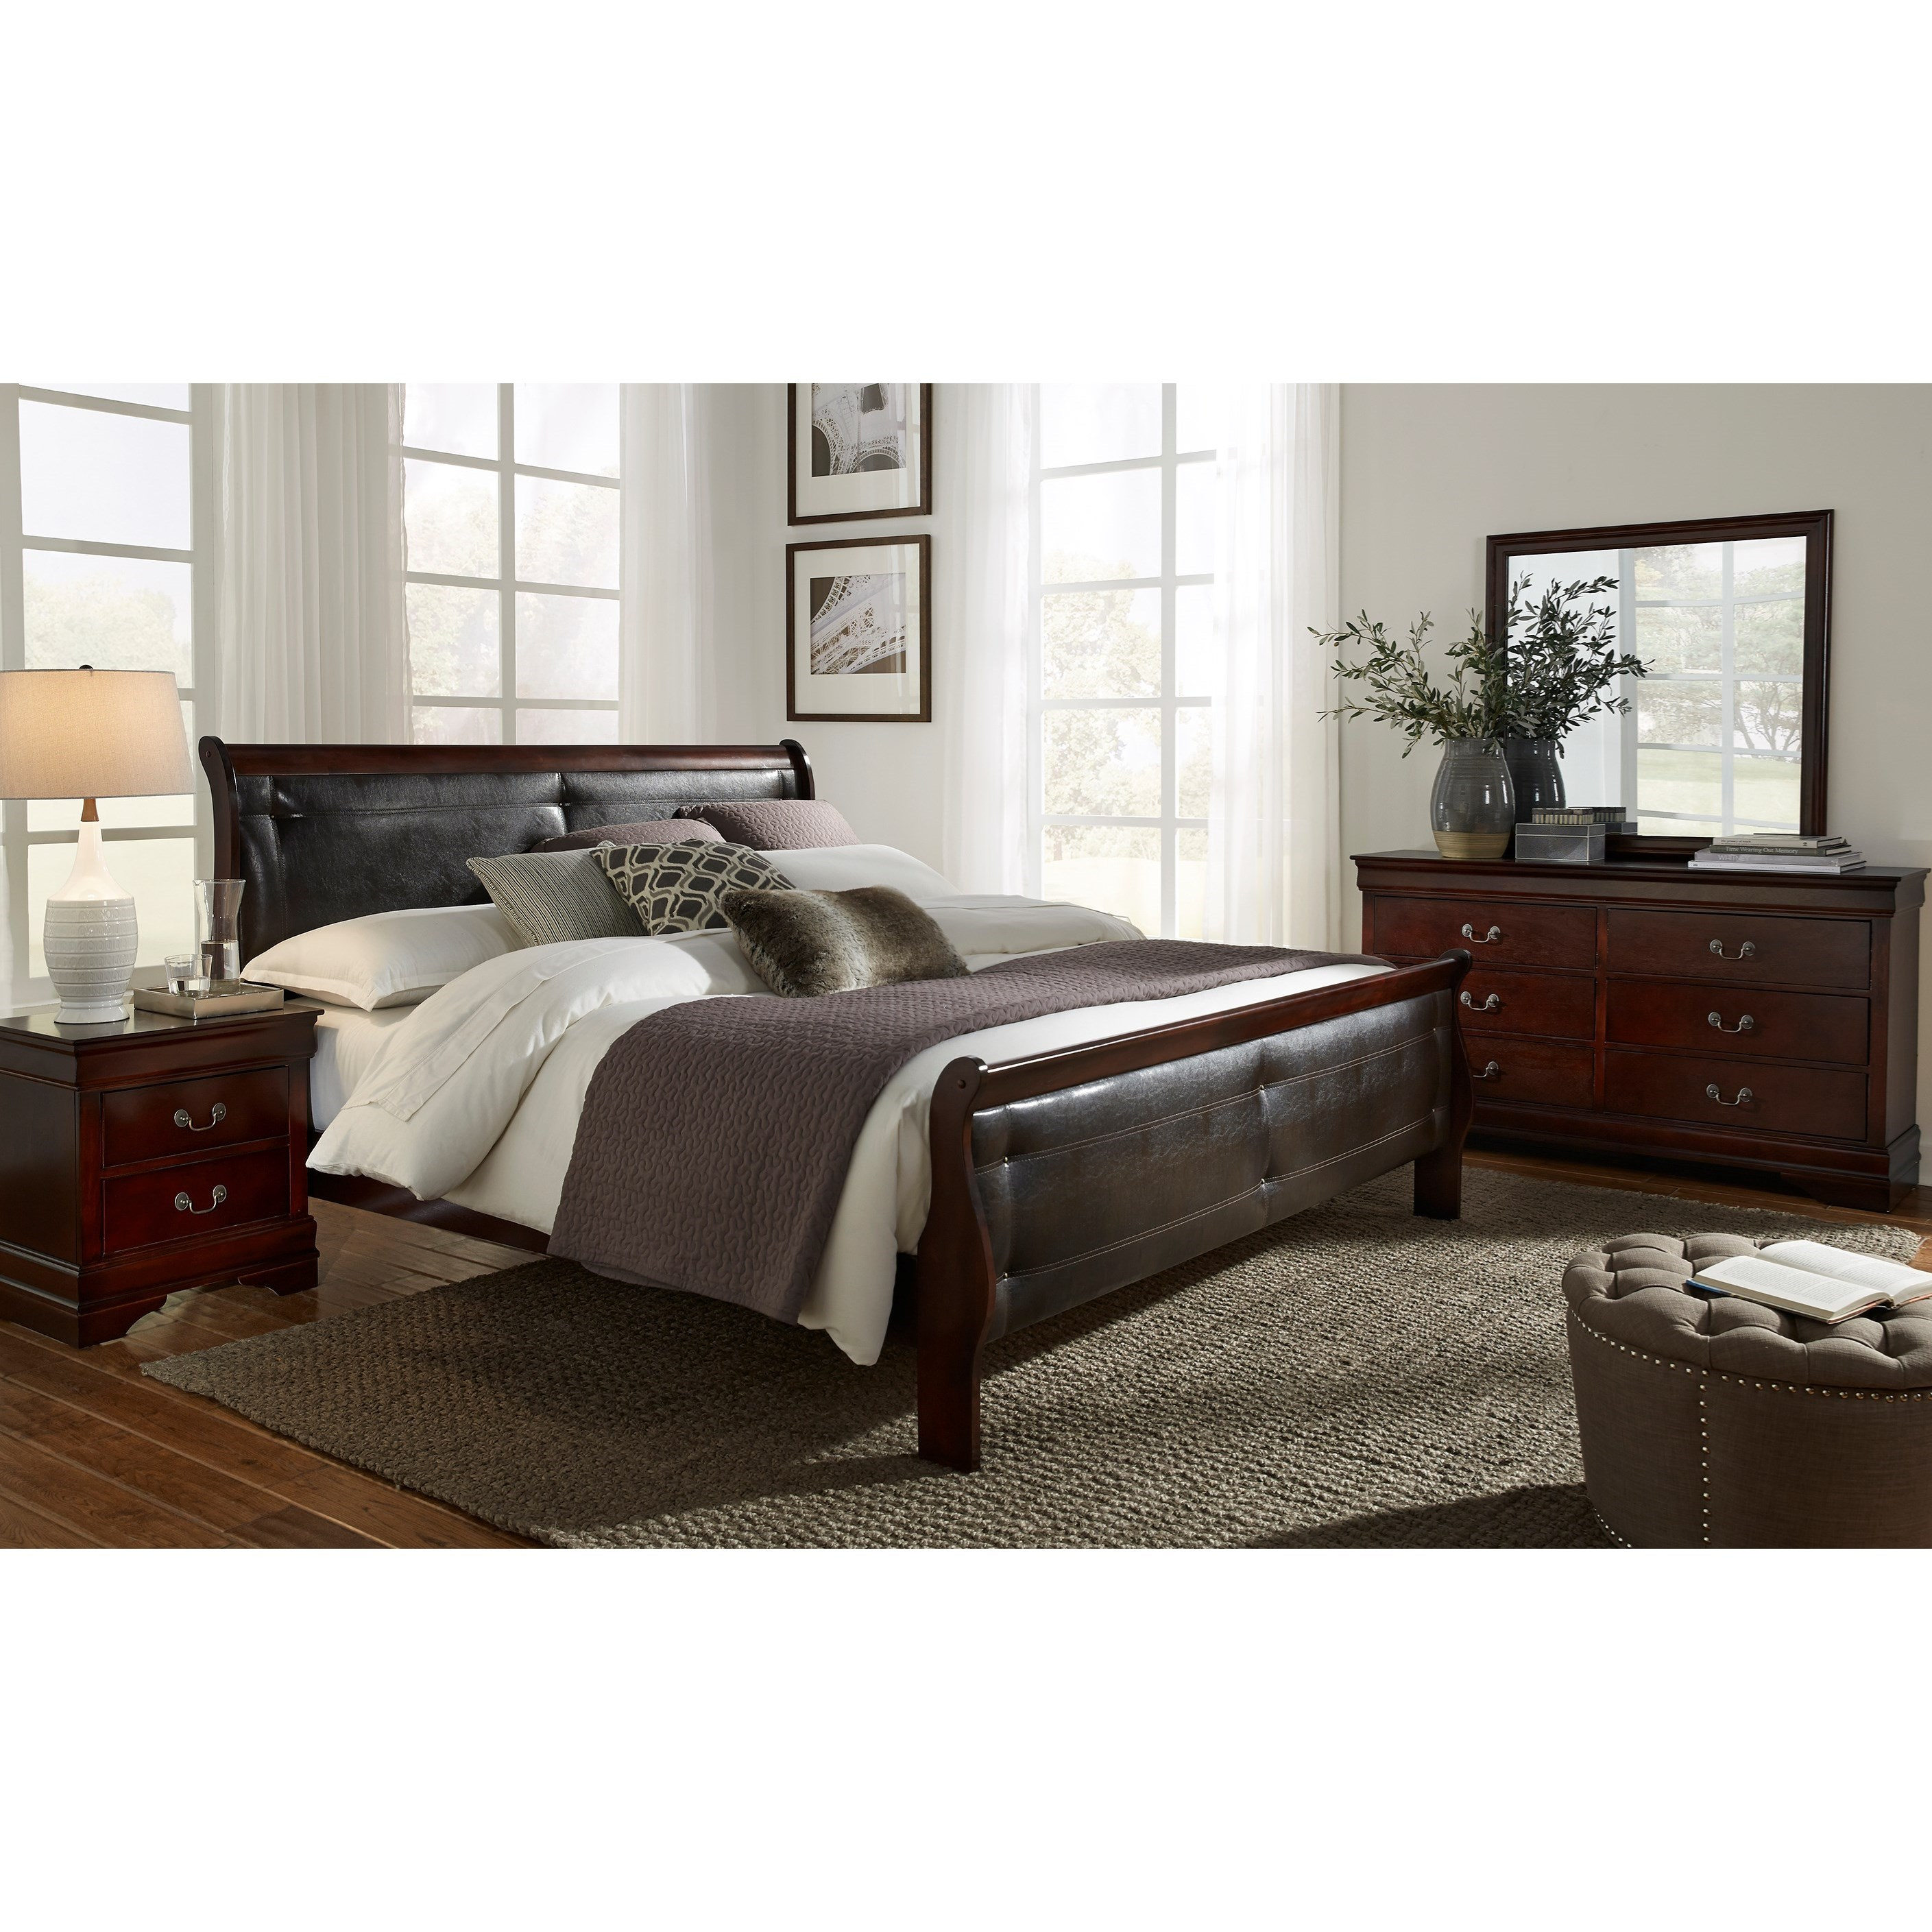 Global Furniture Marley Queen Bedroom Group Value City Furniture Bedroom Groups